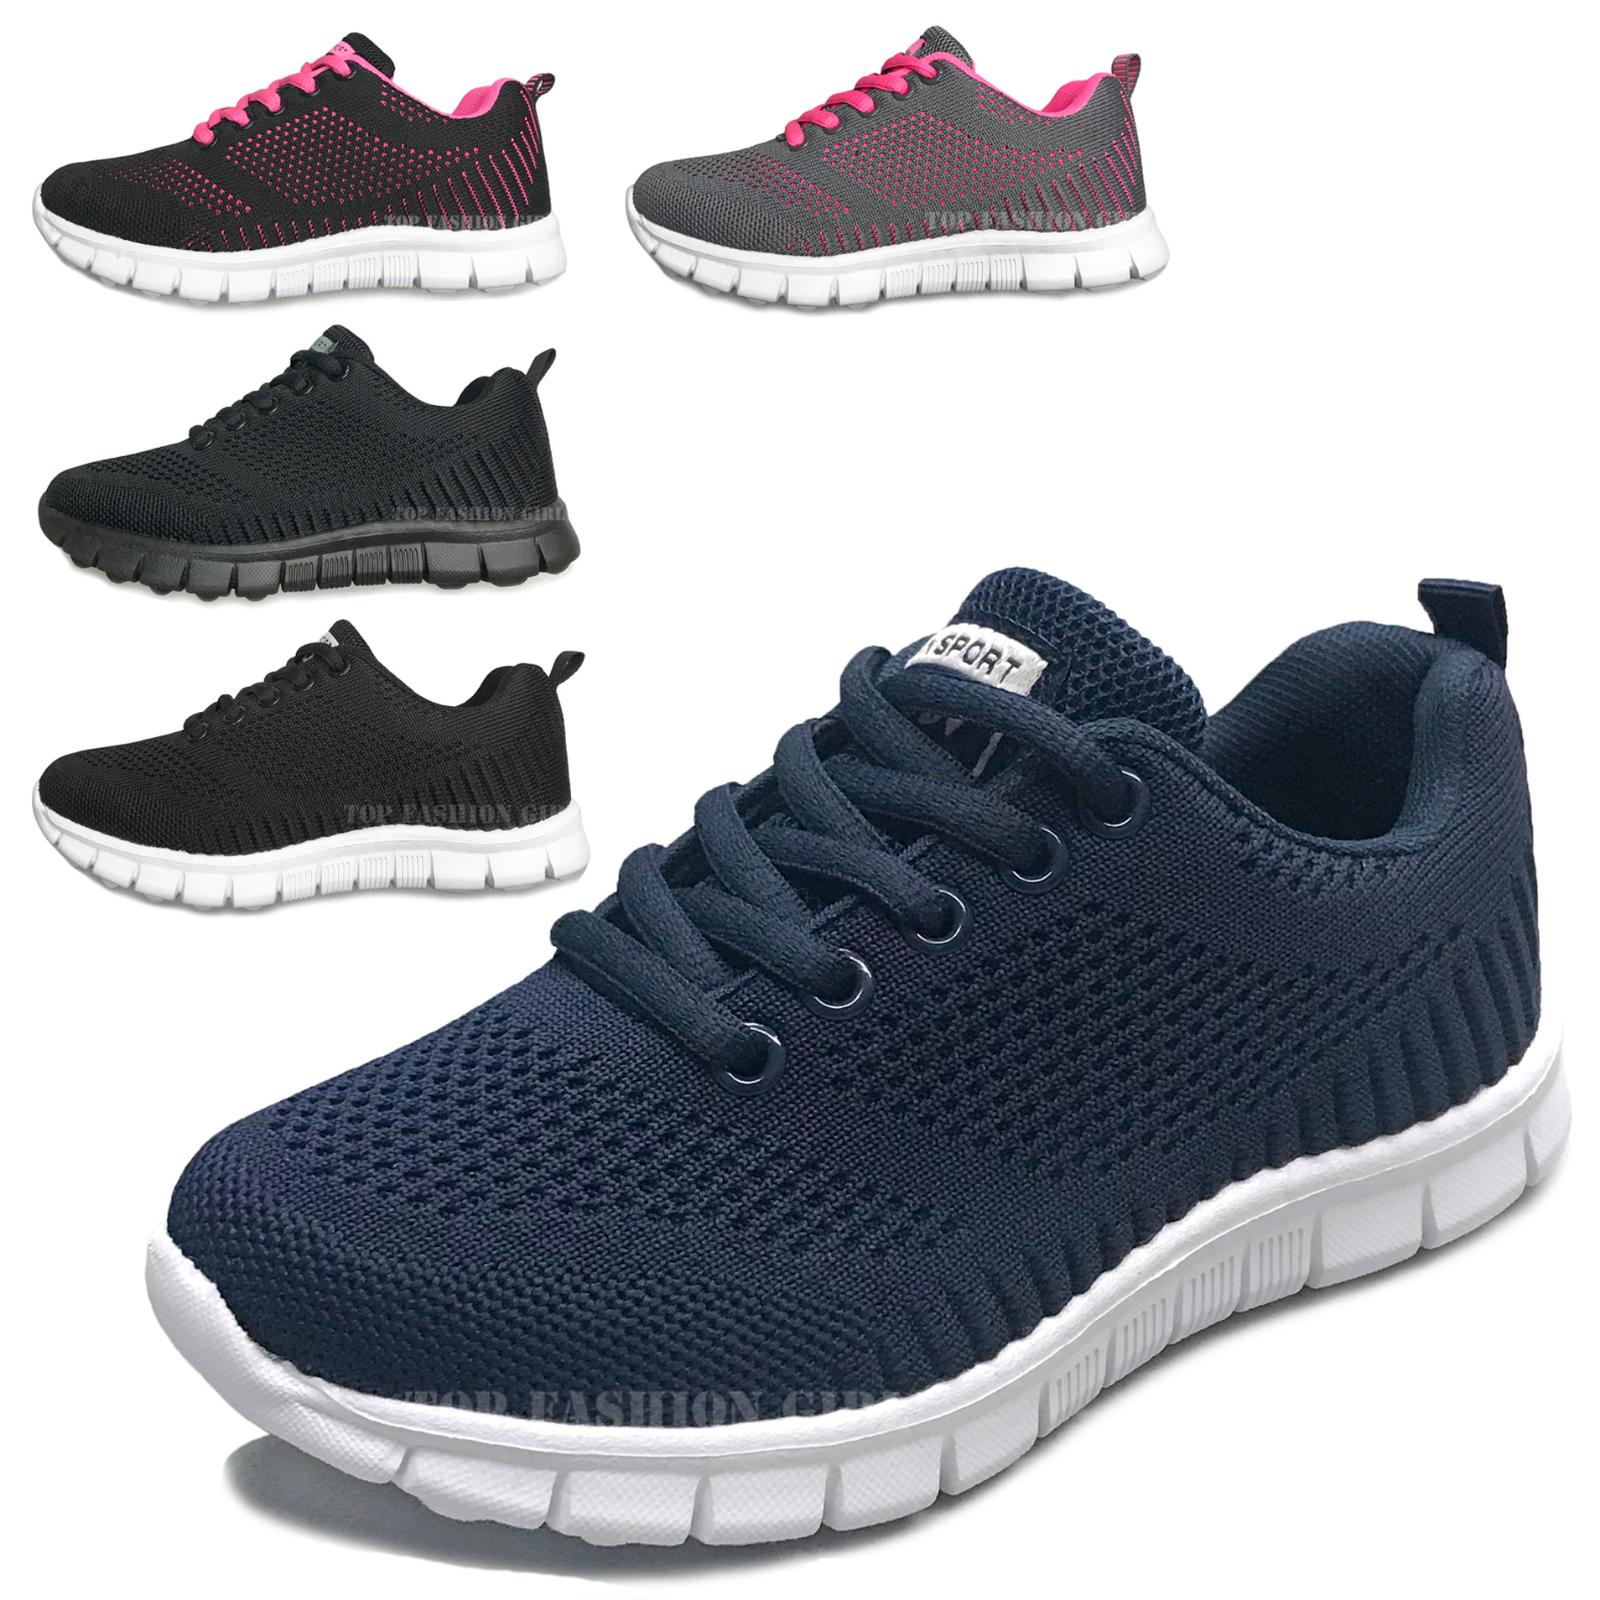 NEW Kids Sneakers Boys Girls Mesh Lace Up Sporty Tennis Shoe